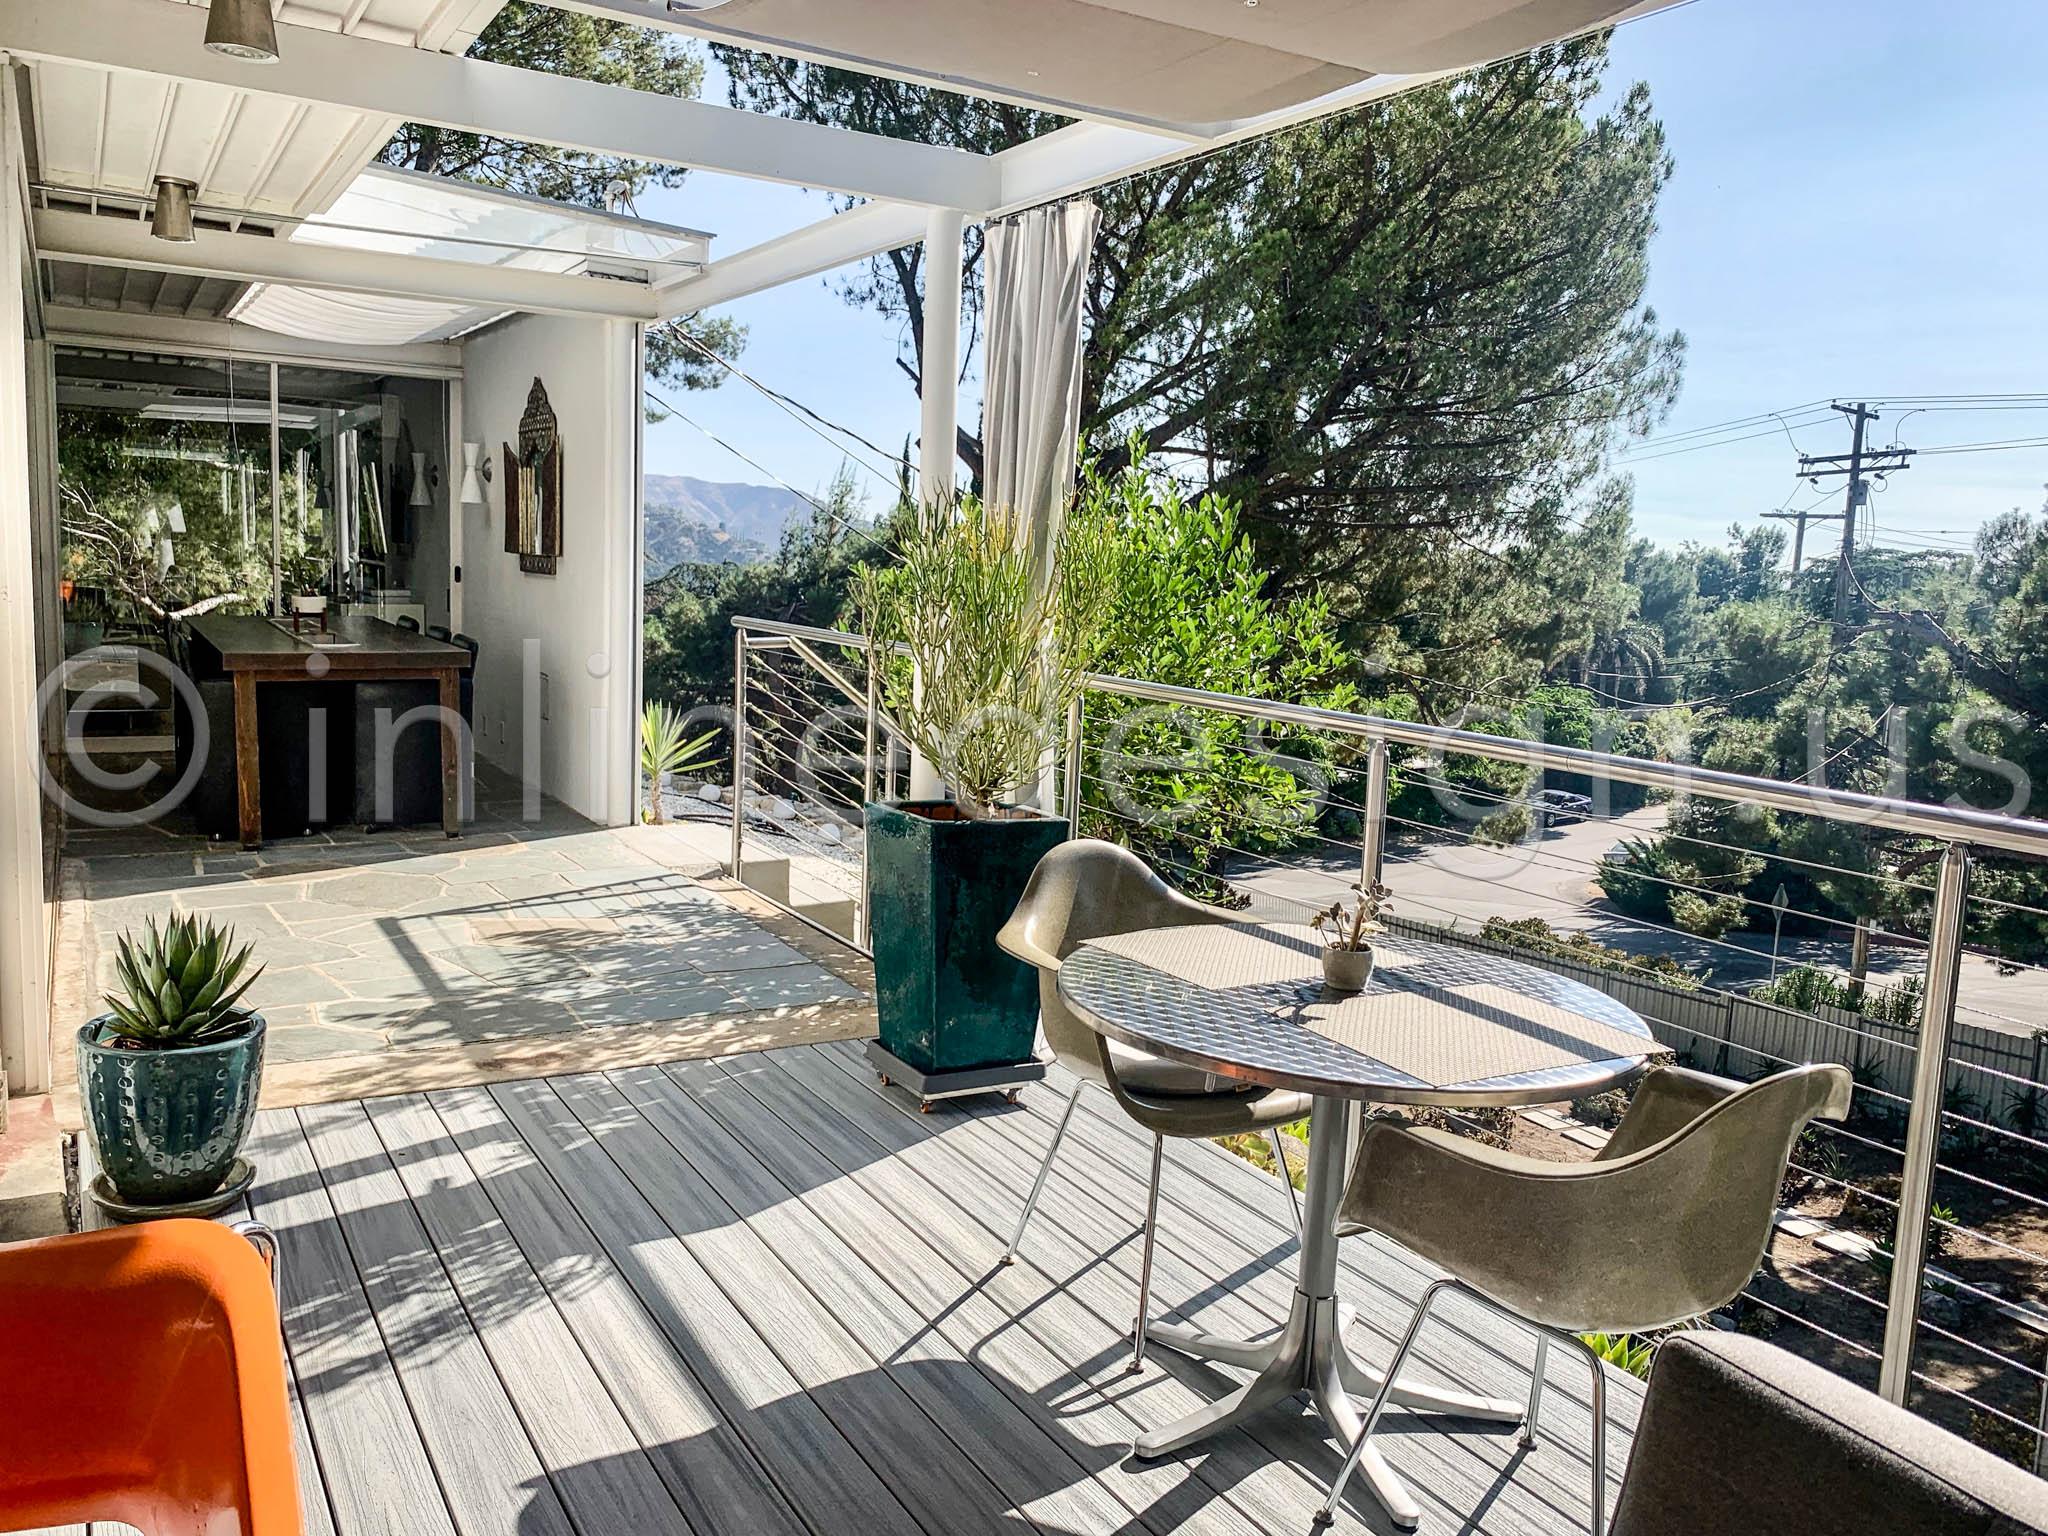 inline design announces major fall sale on cable railings. Black Bedroom Furniture Sets. Home Design Ideas